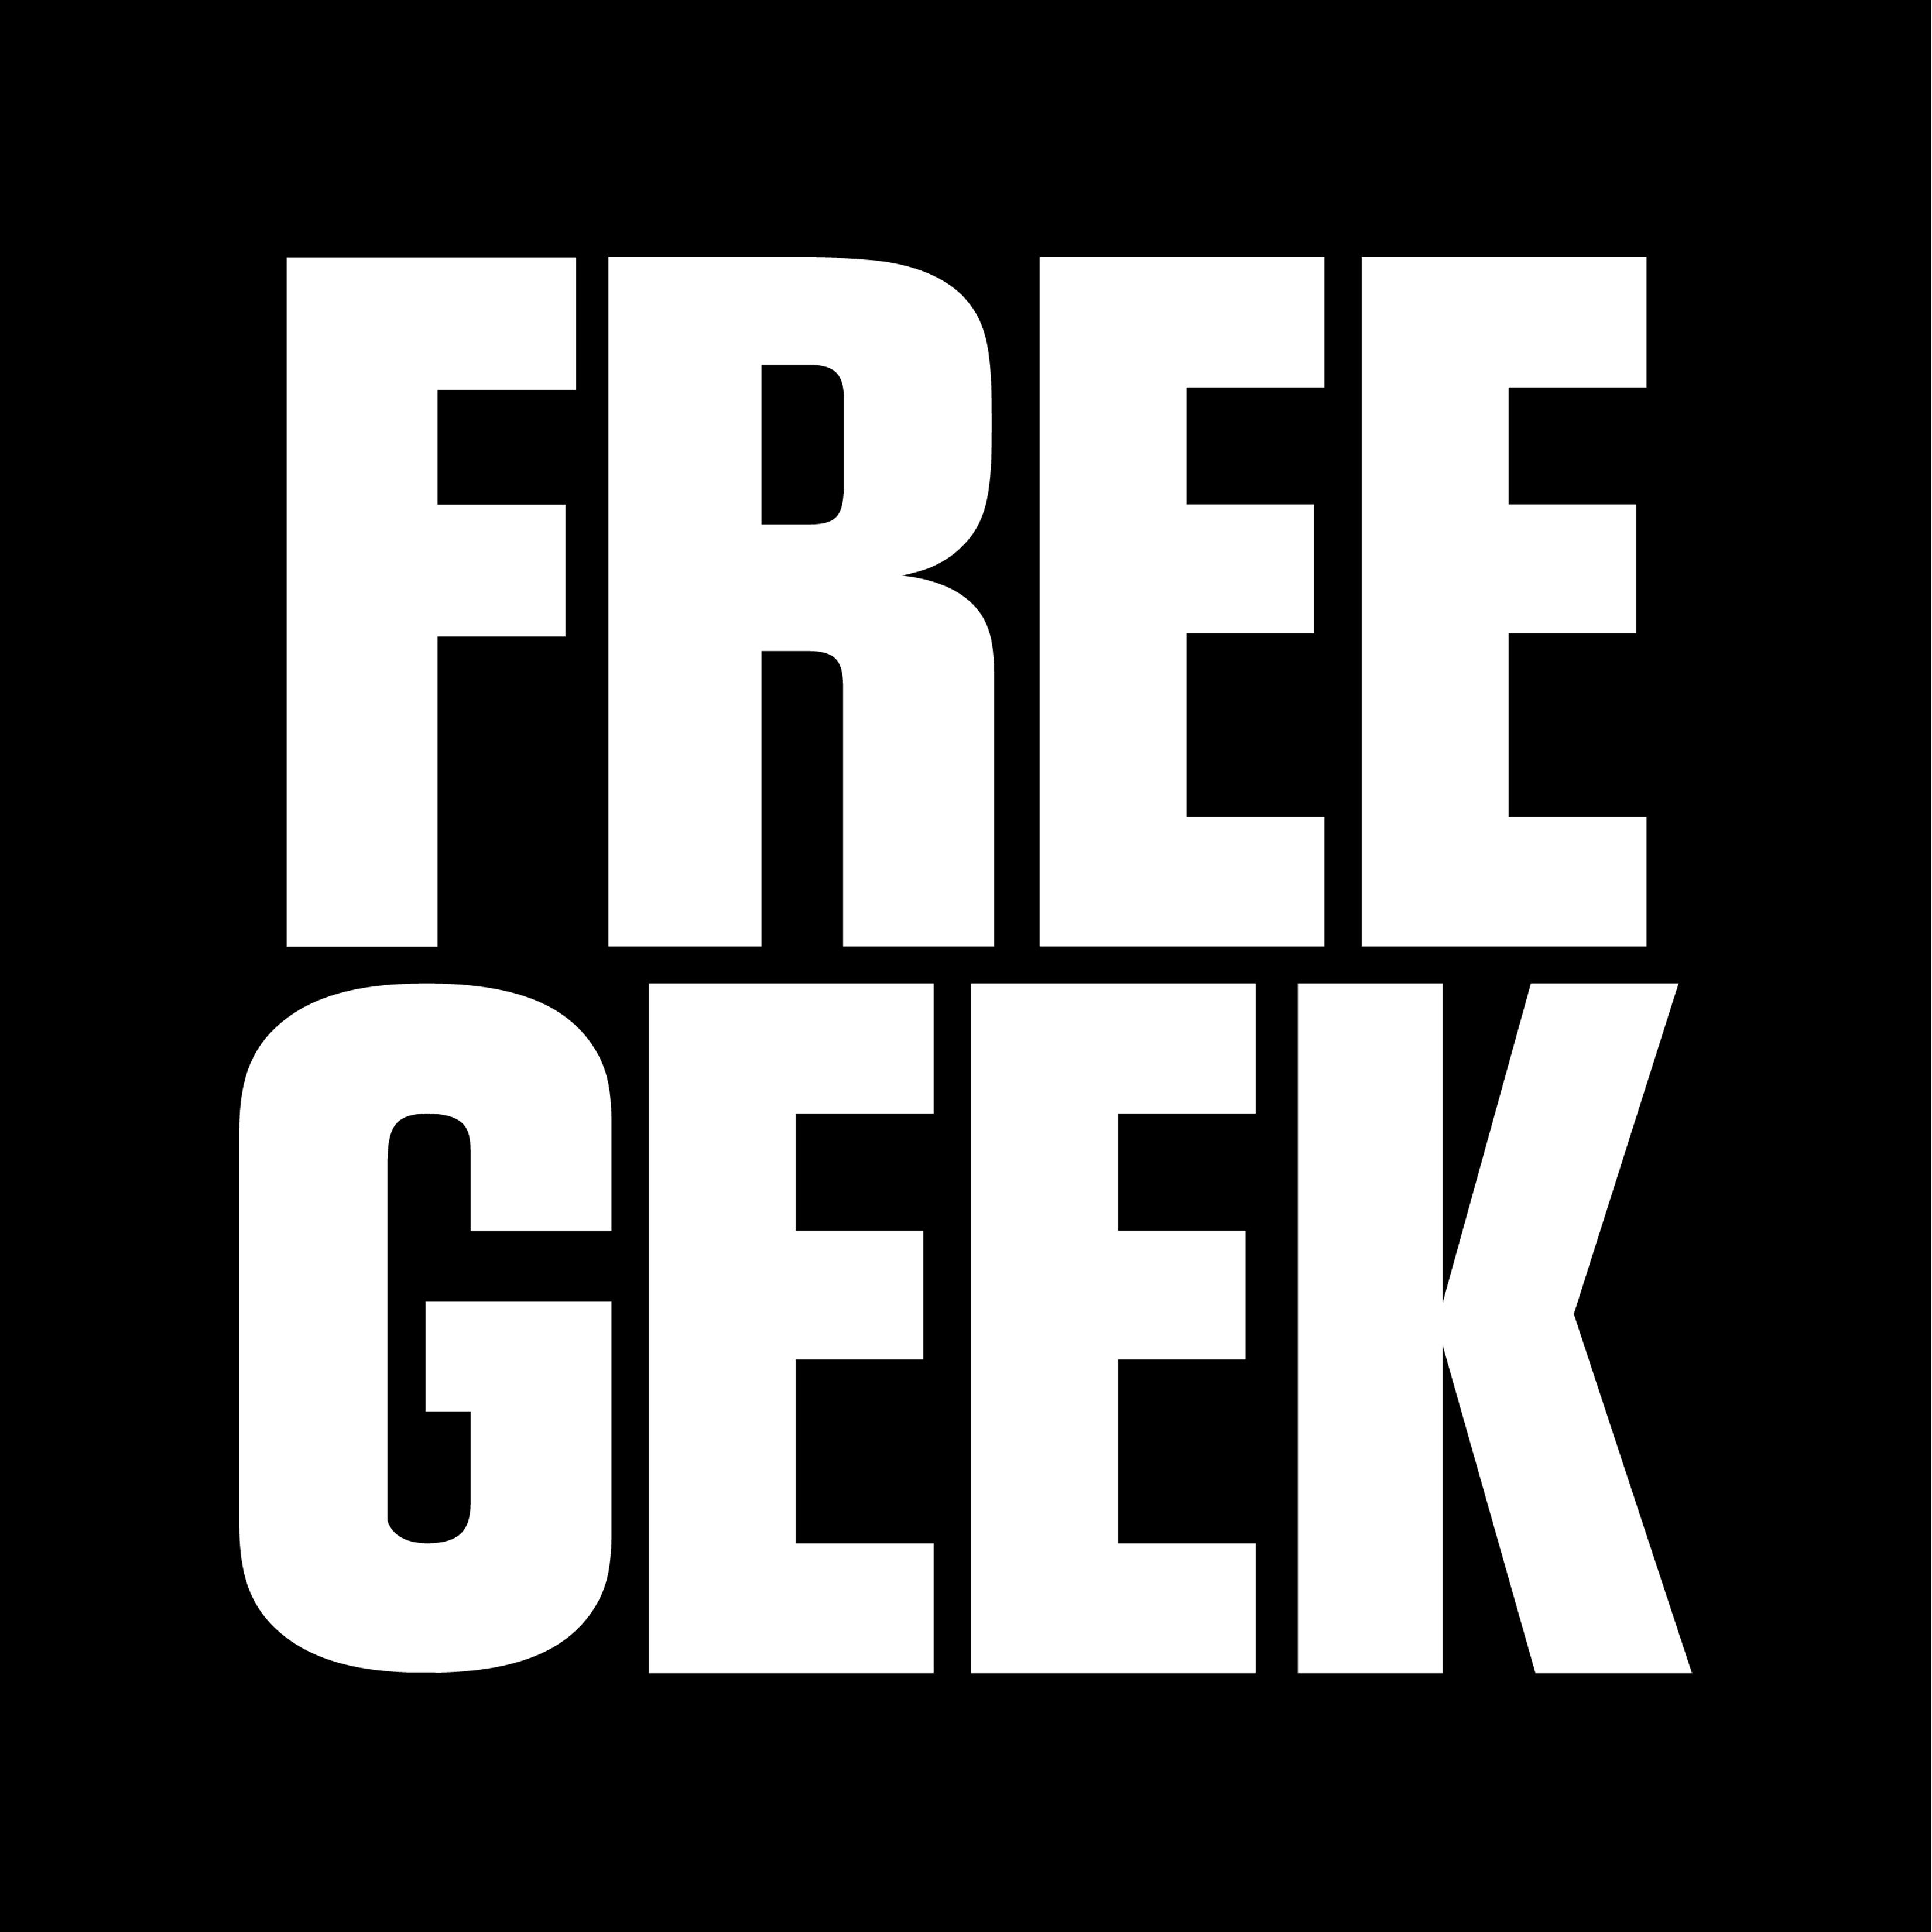 freegeek